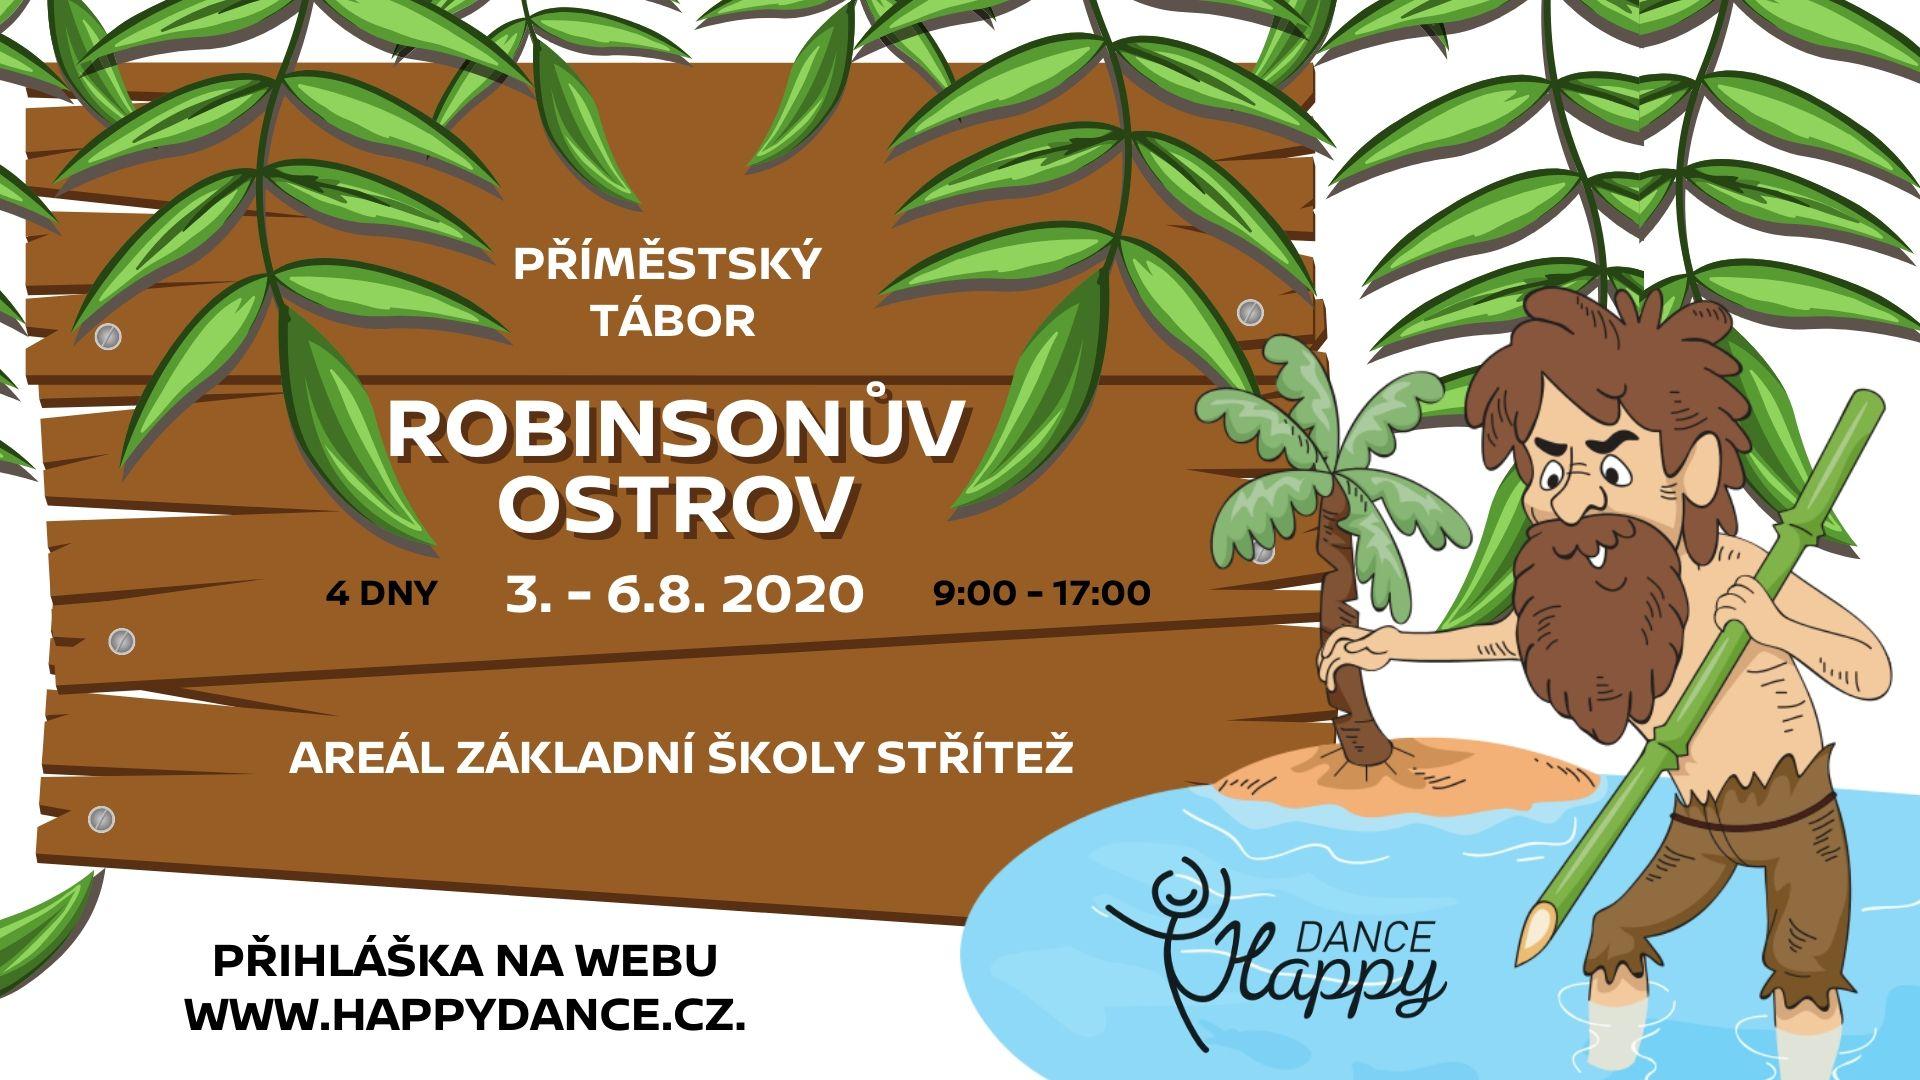 -Robinsonův ostrov_2020_EVENT